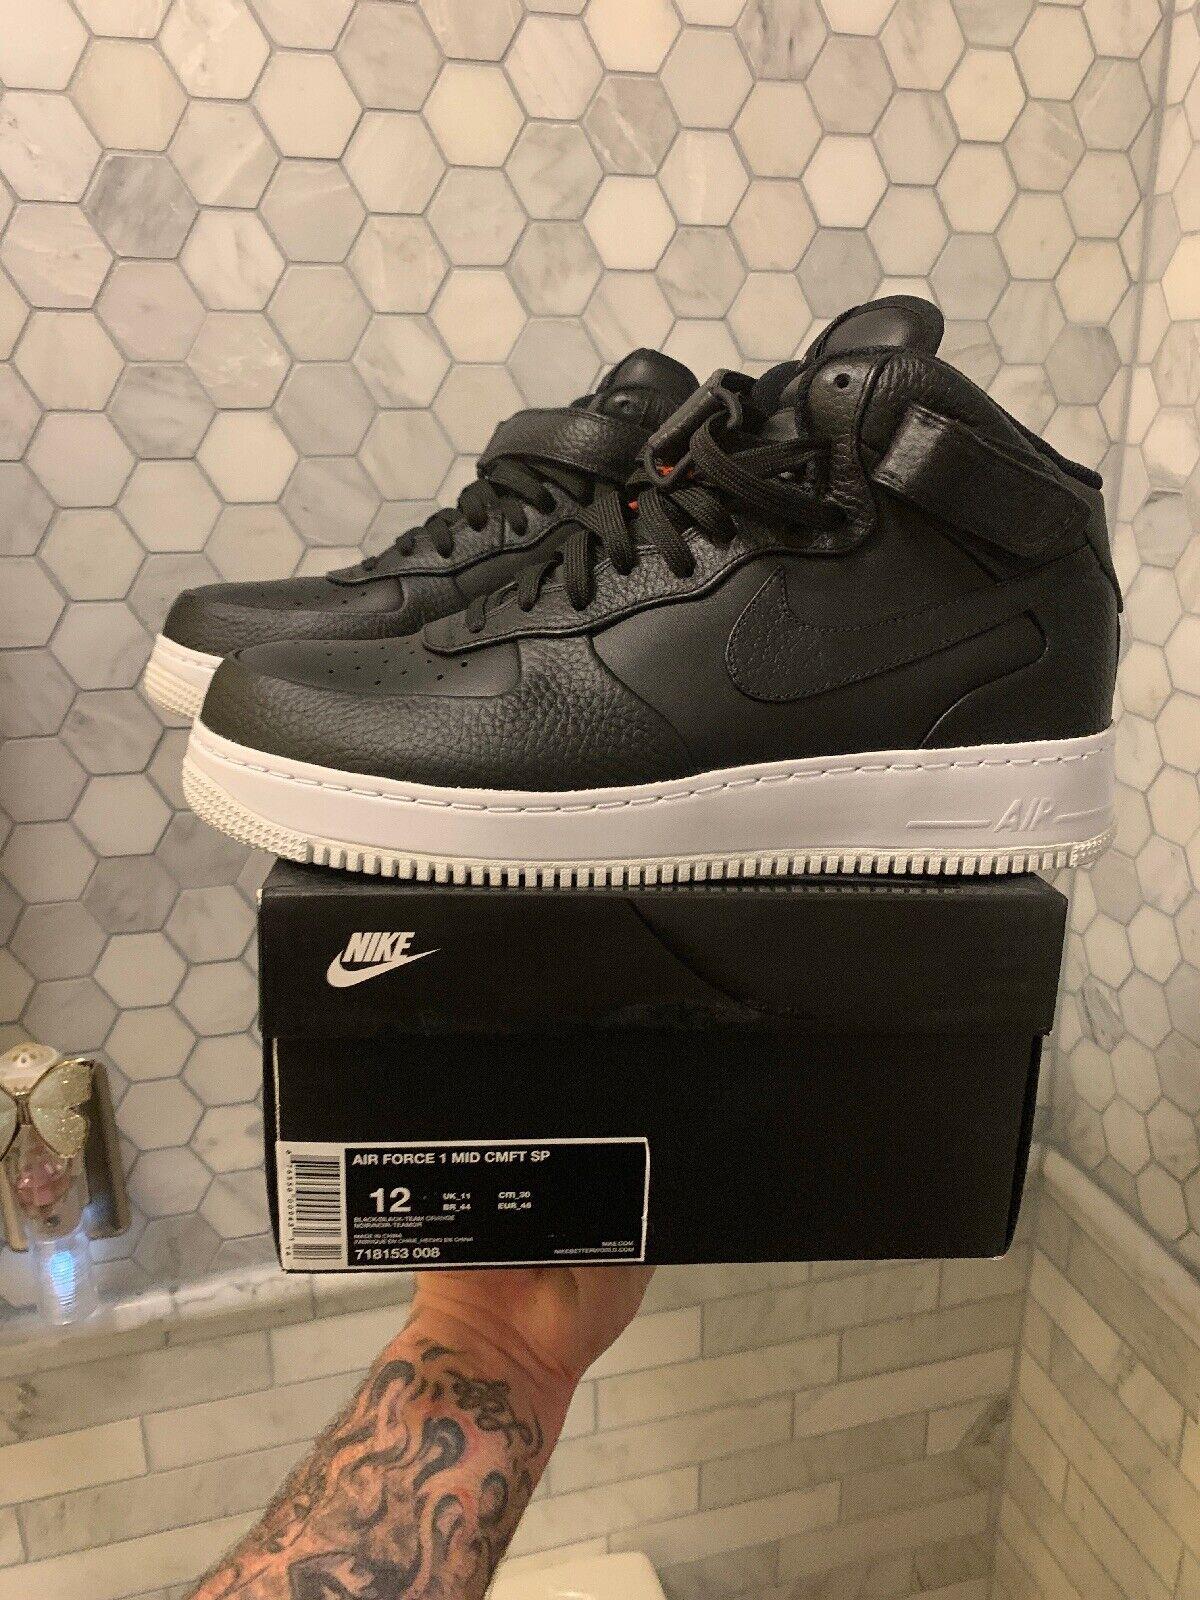 Nike Air Force 1 MID CMFT SP 718153 008 NikeLab Black Men's Size 12